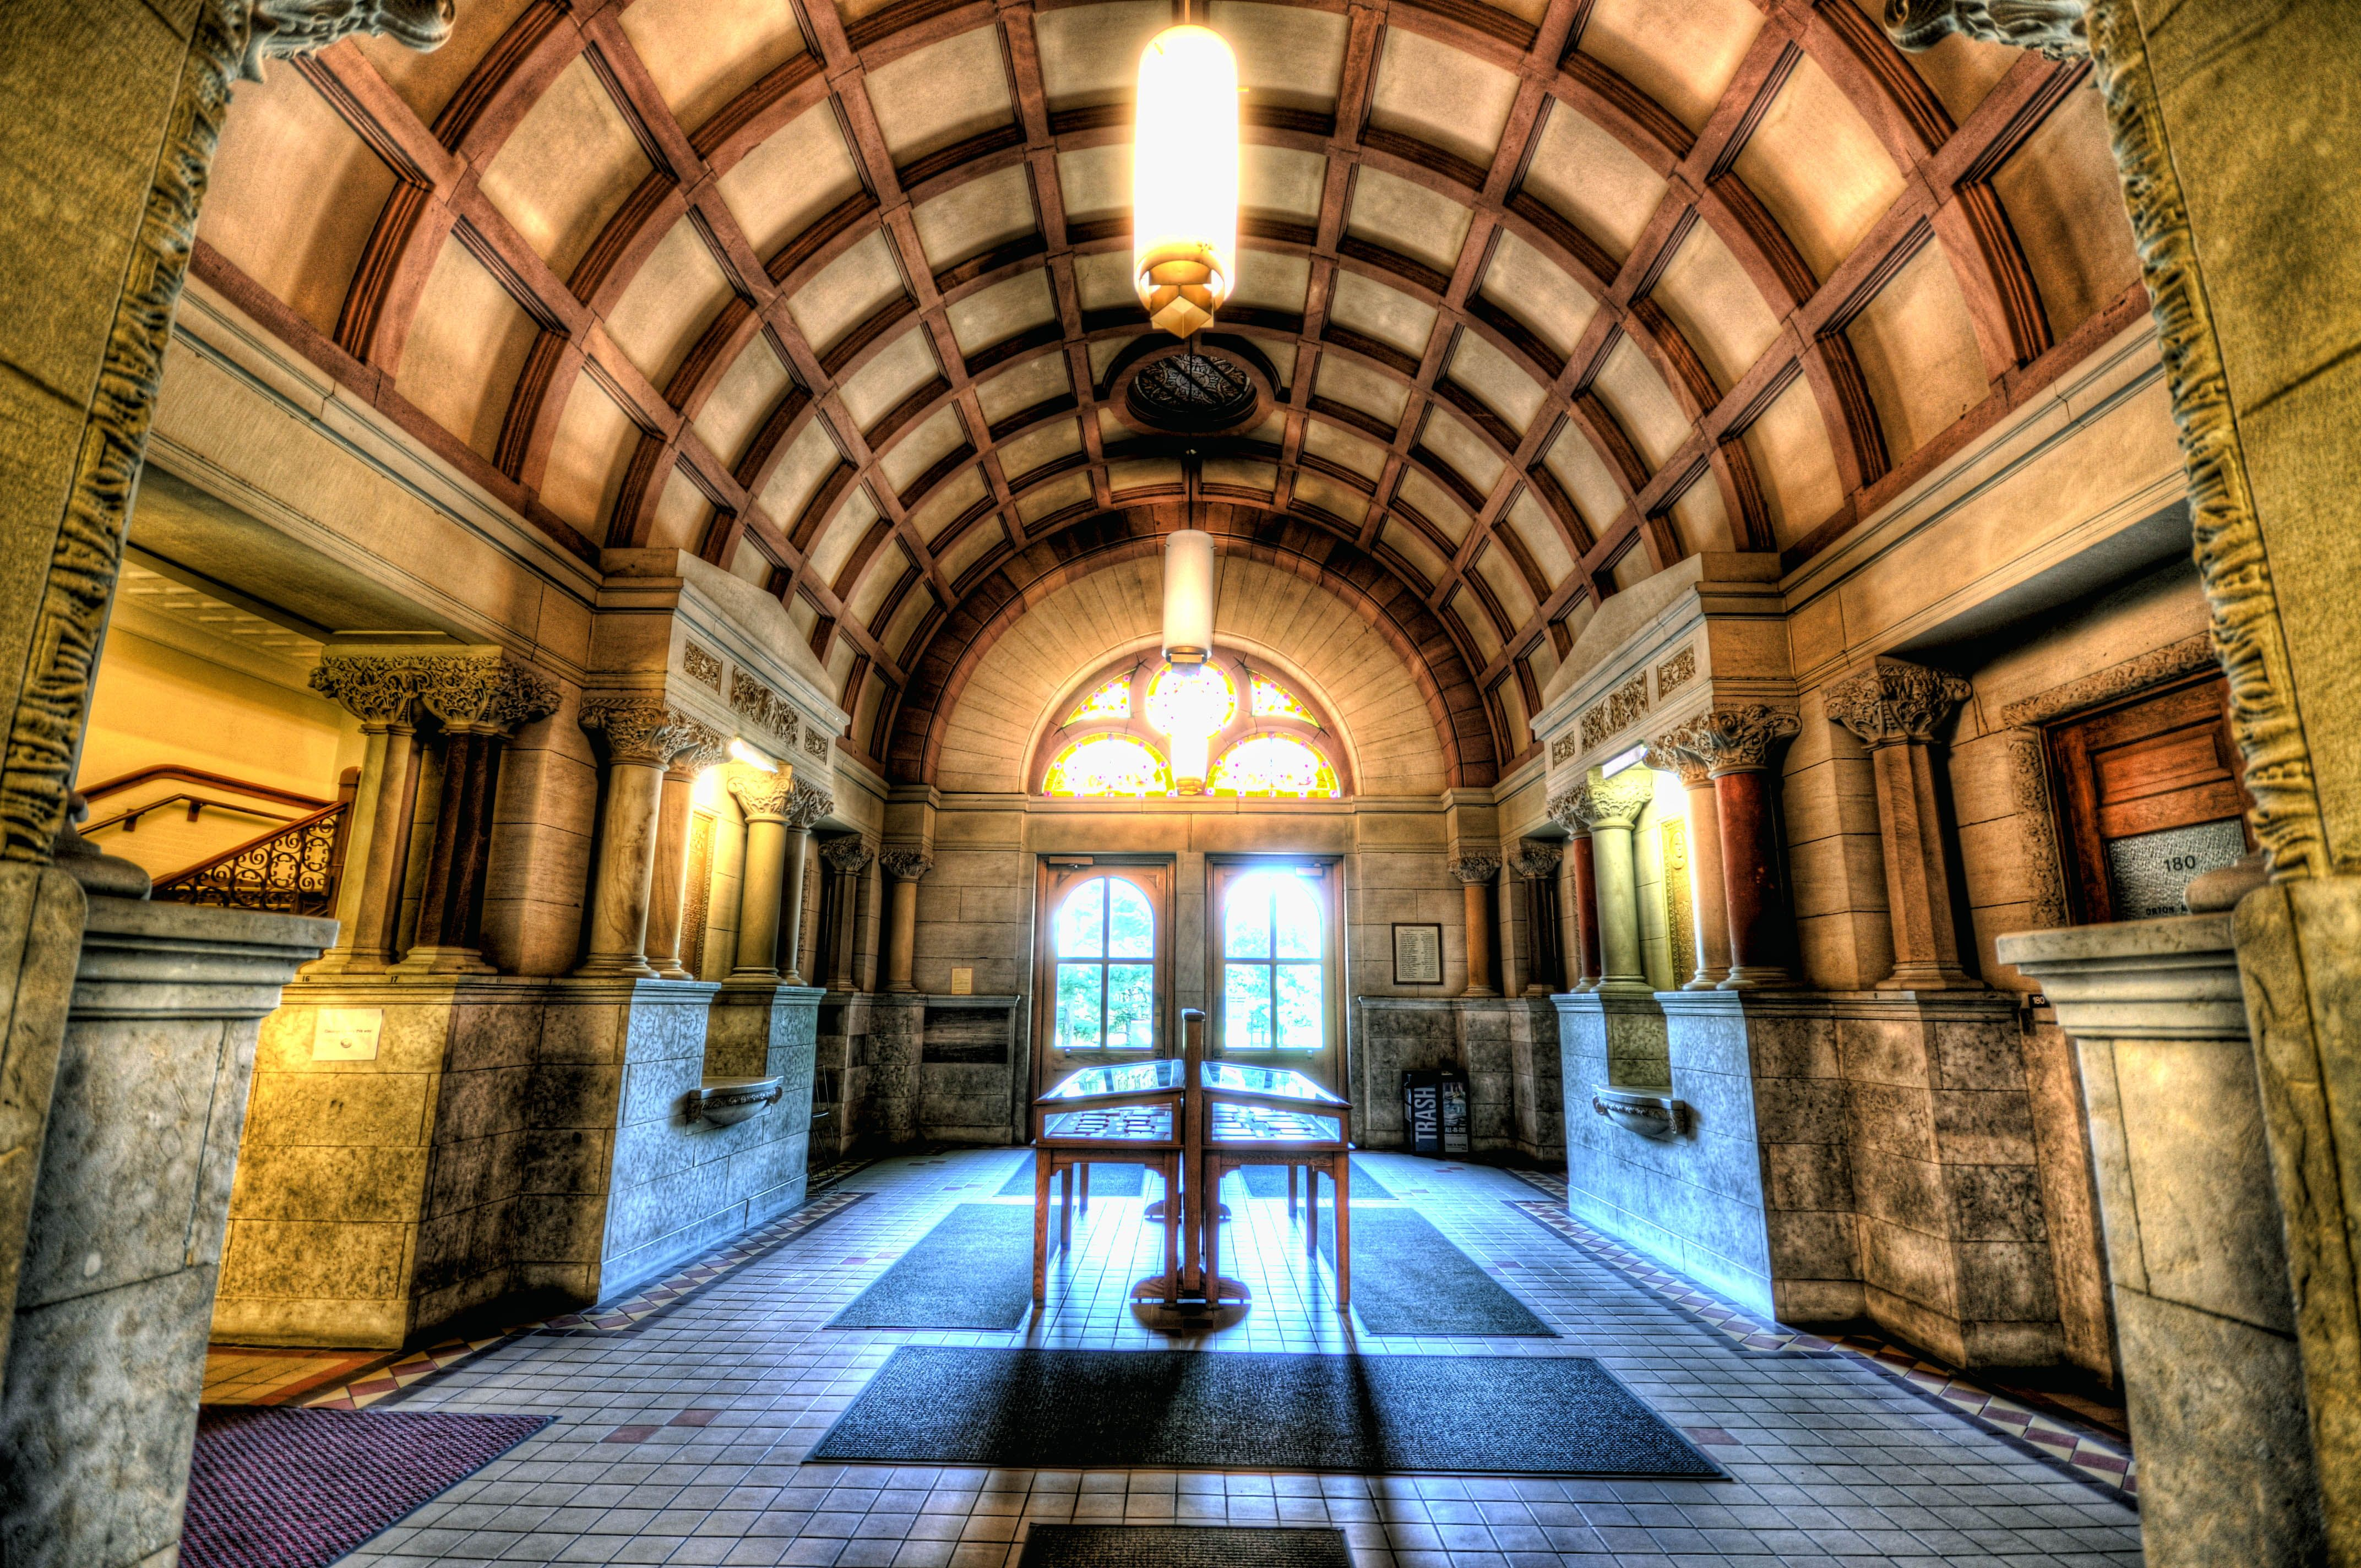 Ohio state university brutus buckeye statue - Ohio State University Being The Oldest Building On Campus This Building Is